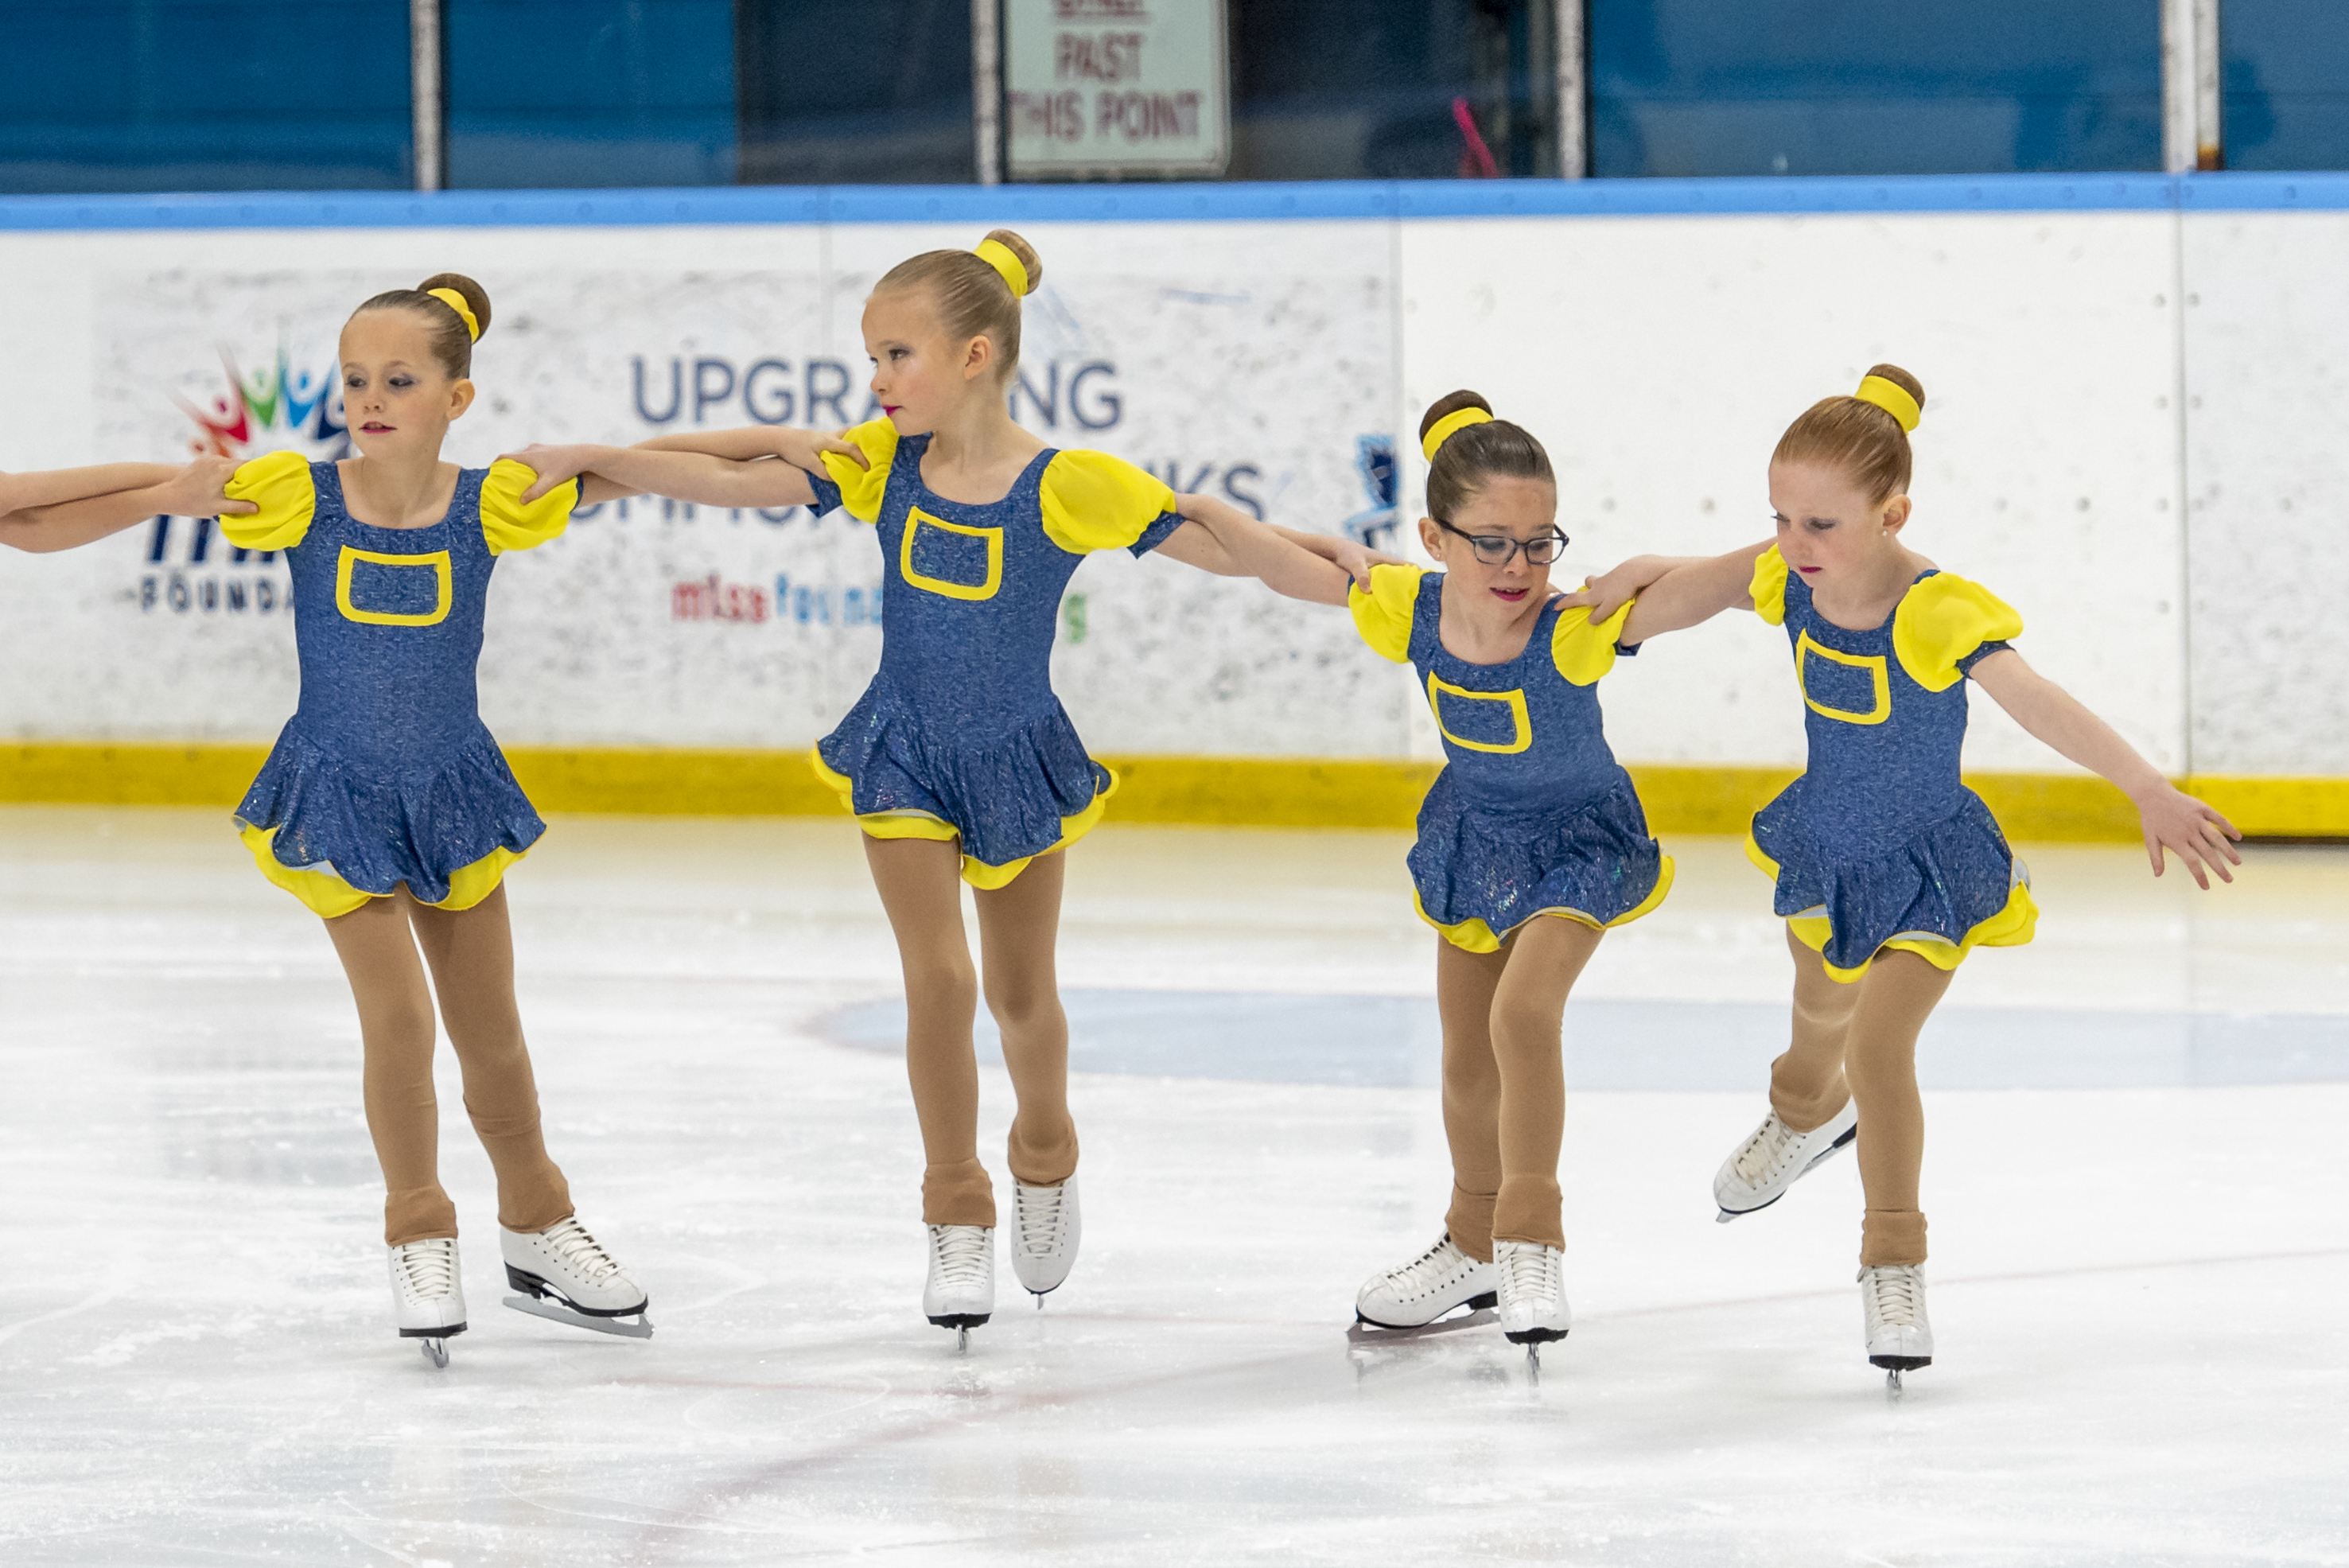 Ice Unite Beginner 2018 - Minions